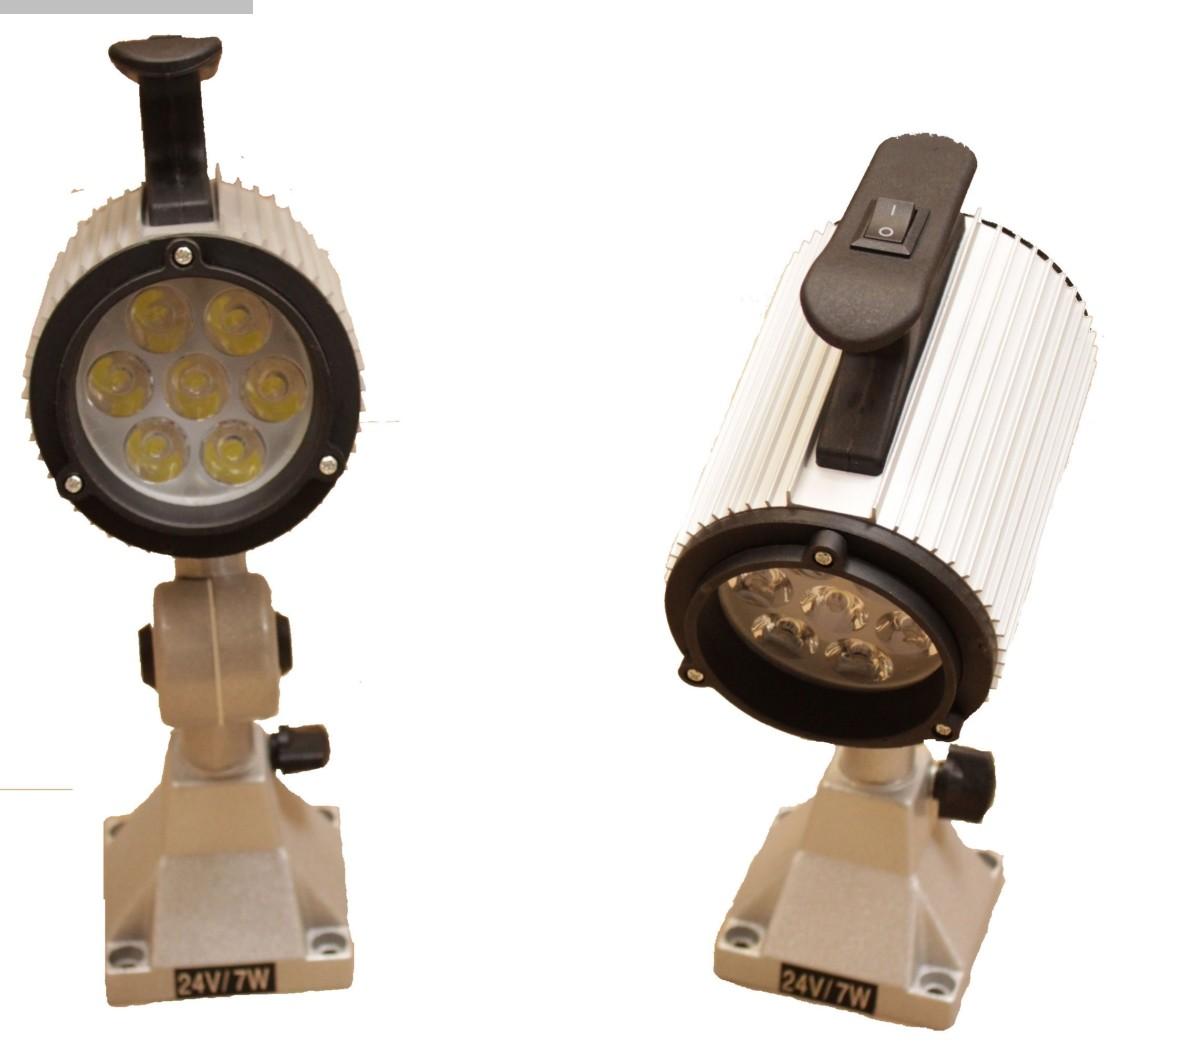 б / у Электротехника Машинные лампы Aalenbach LED Maschinenlampen kurz